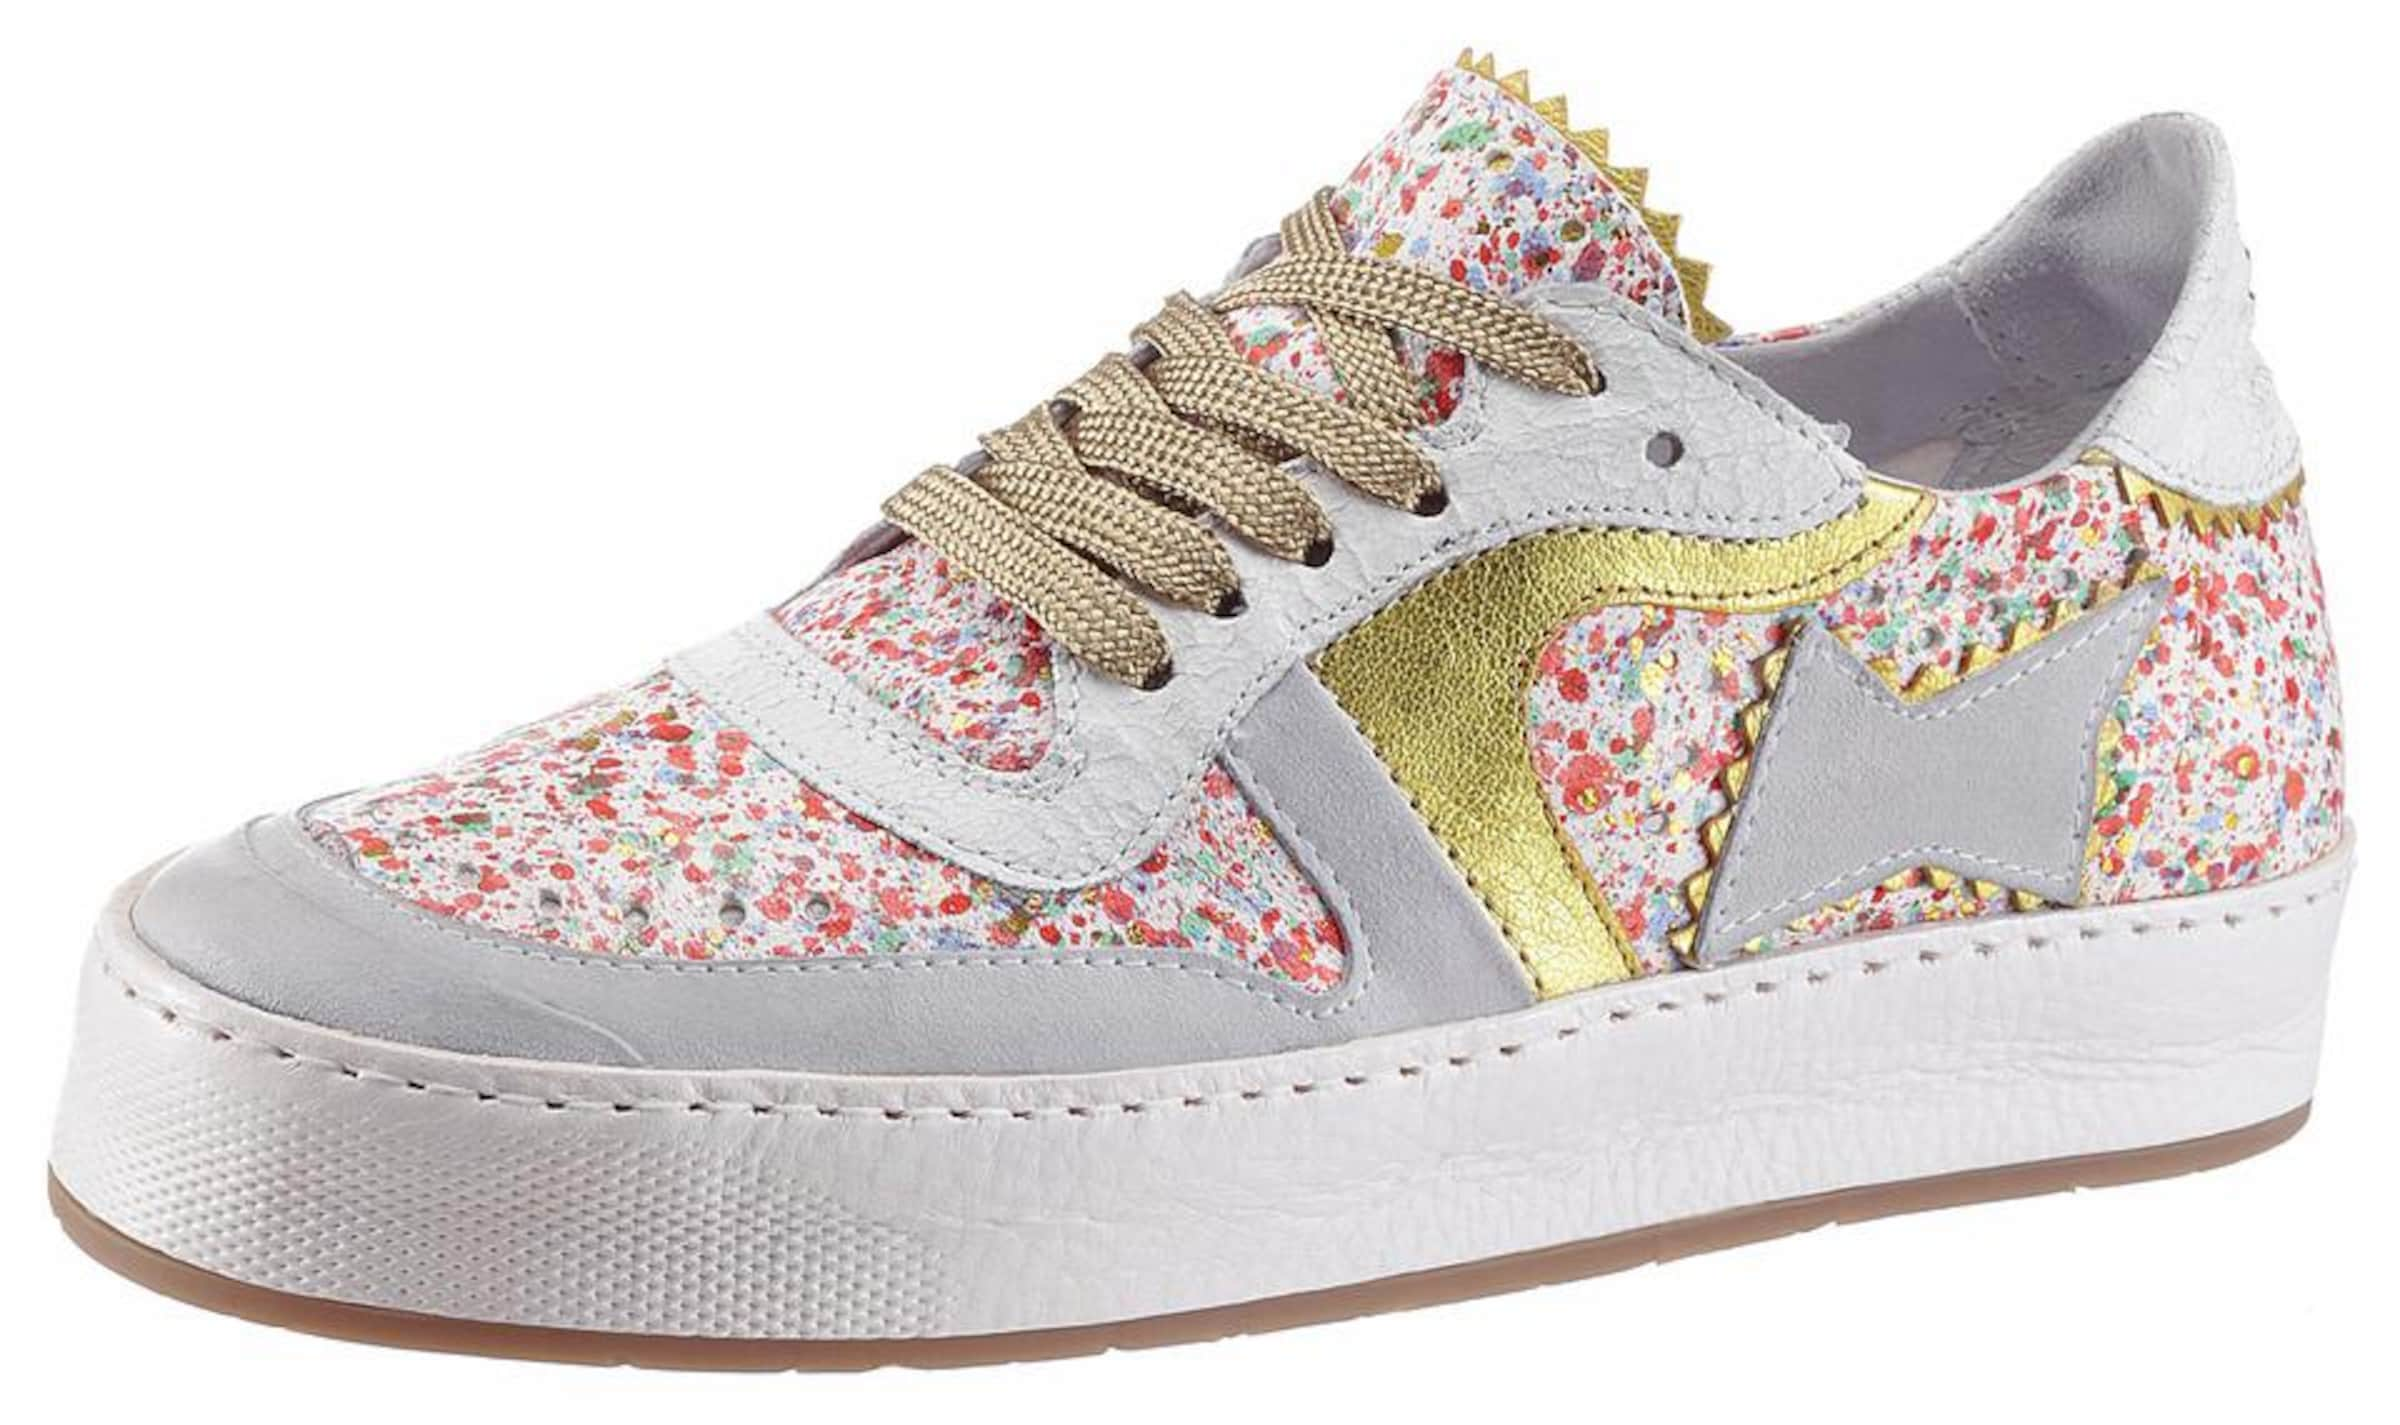 A.S.98 Sneaker Günstige und langlebige Schuhe